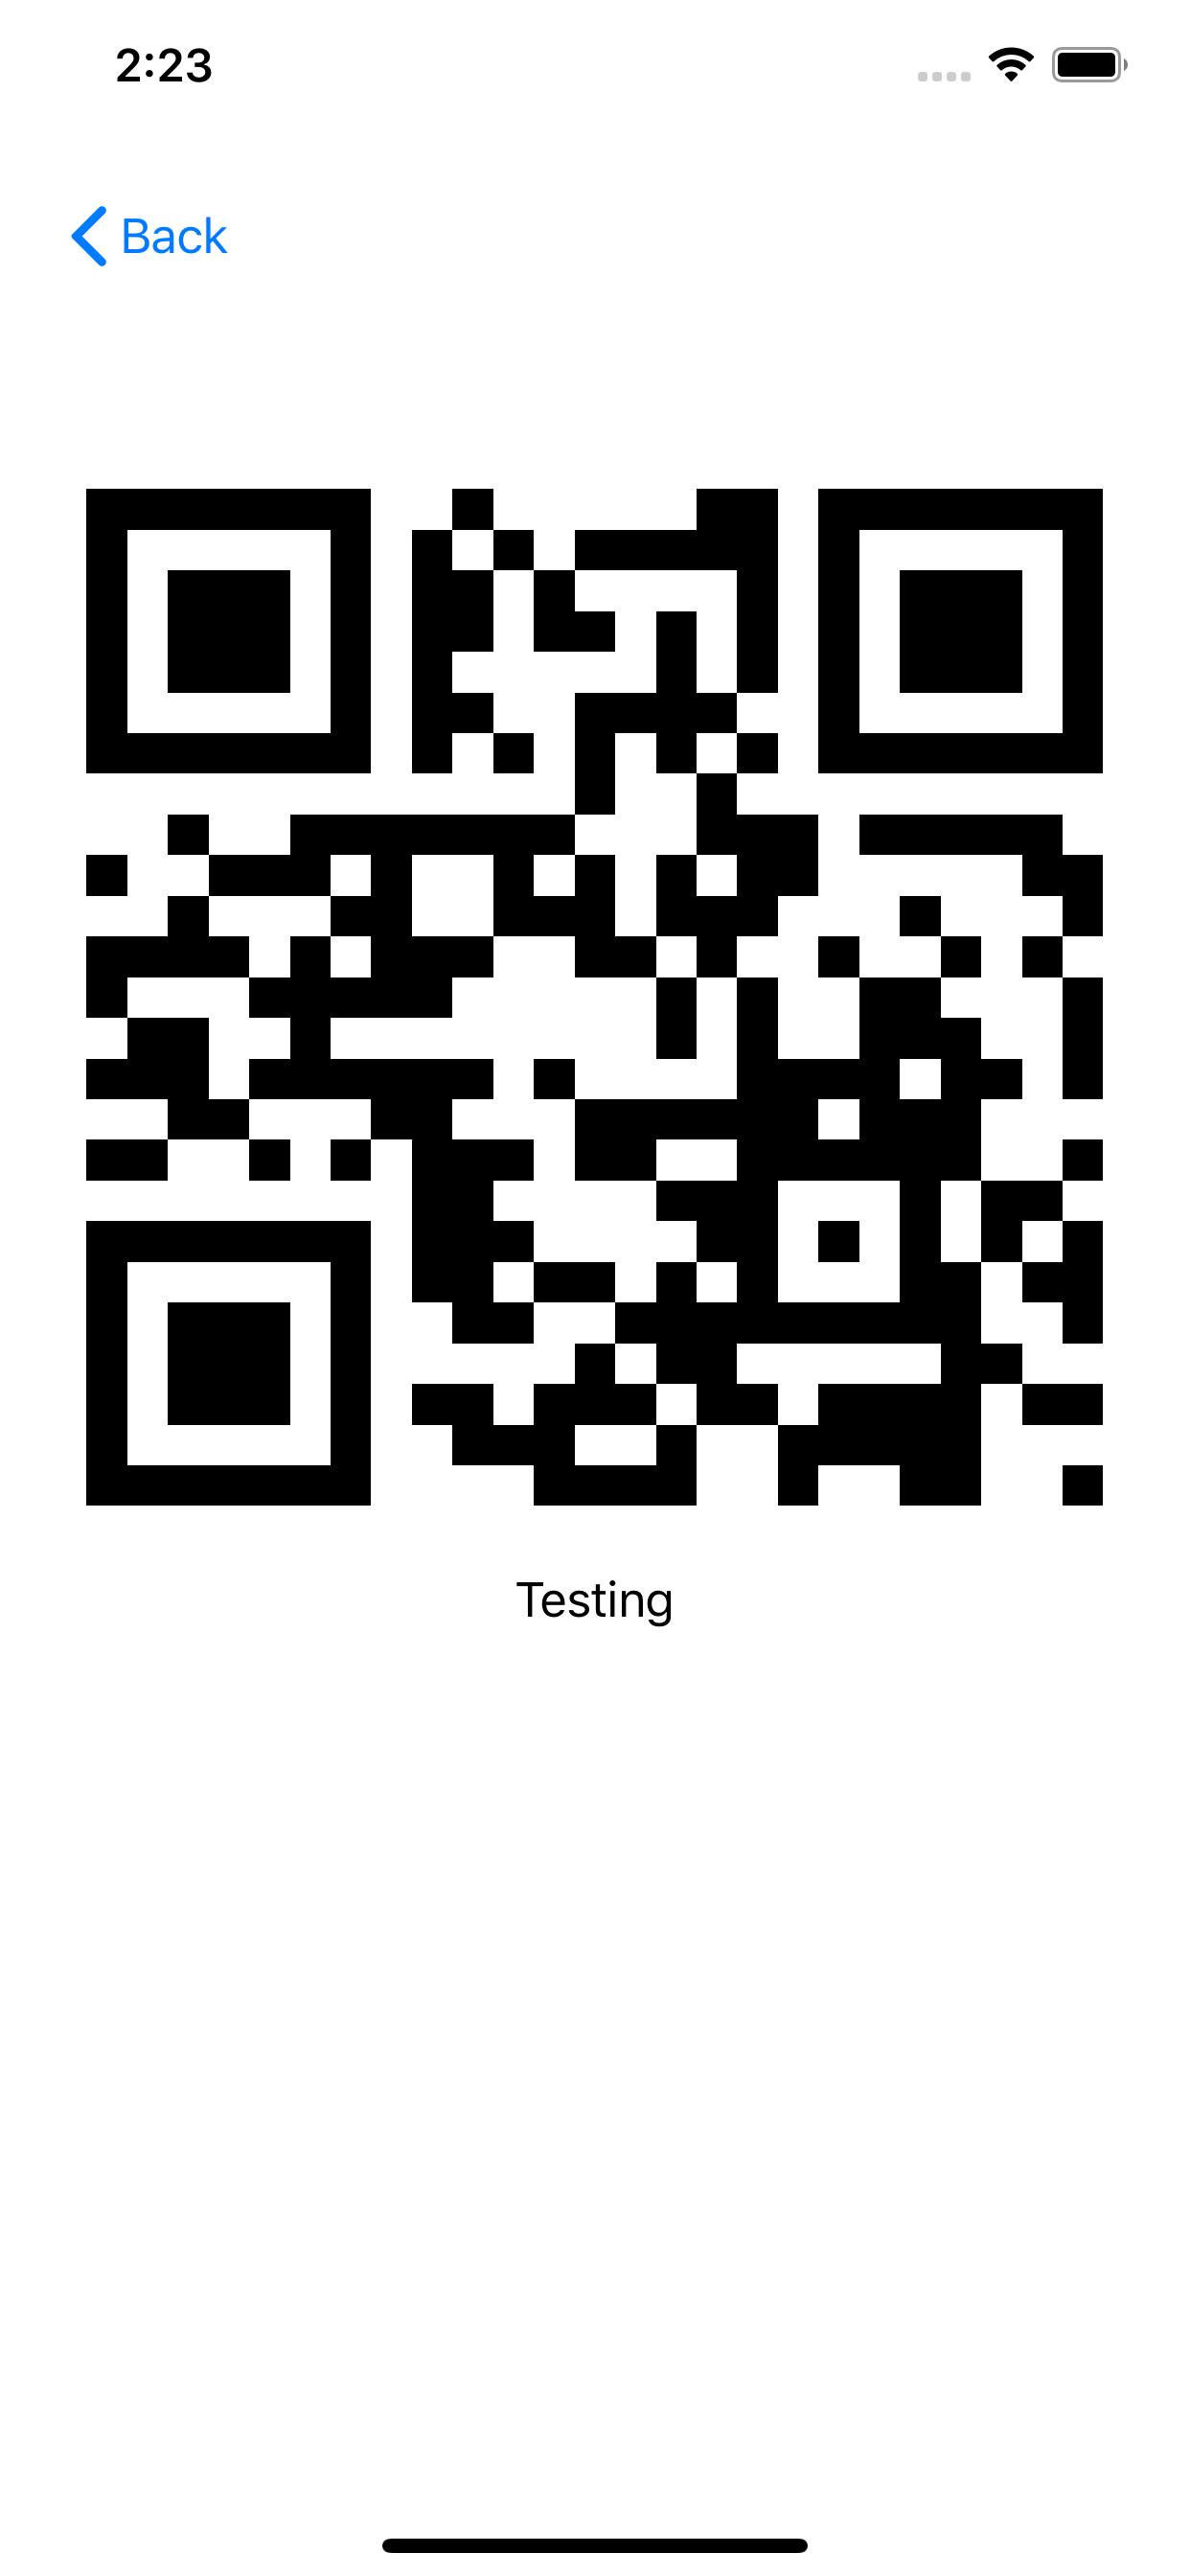 Simulator Screen Shot - iPhone 11 Pro Max - 2020-01-14 at 02.23.32.png